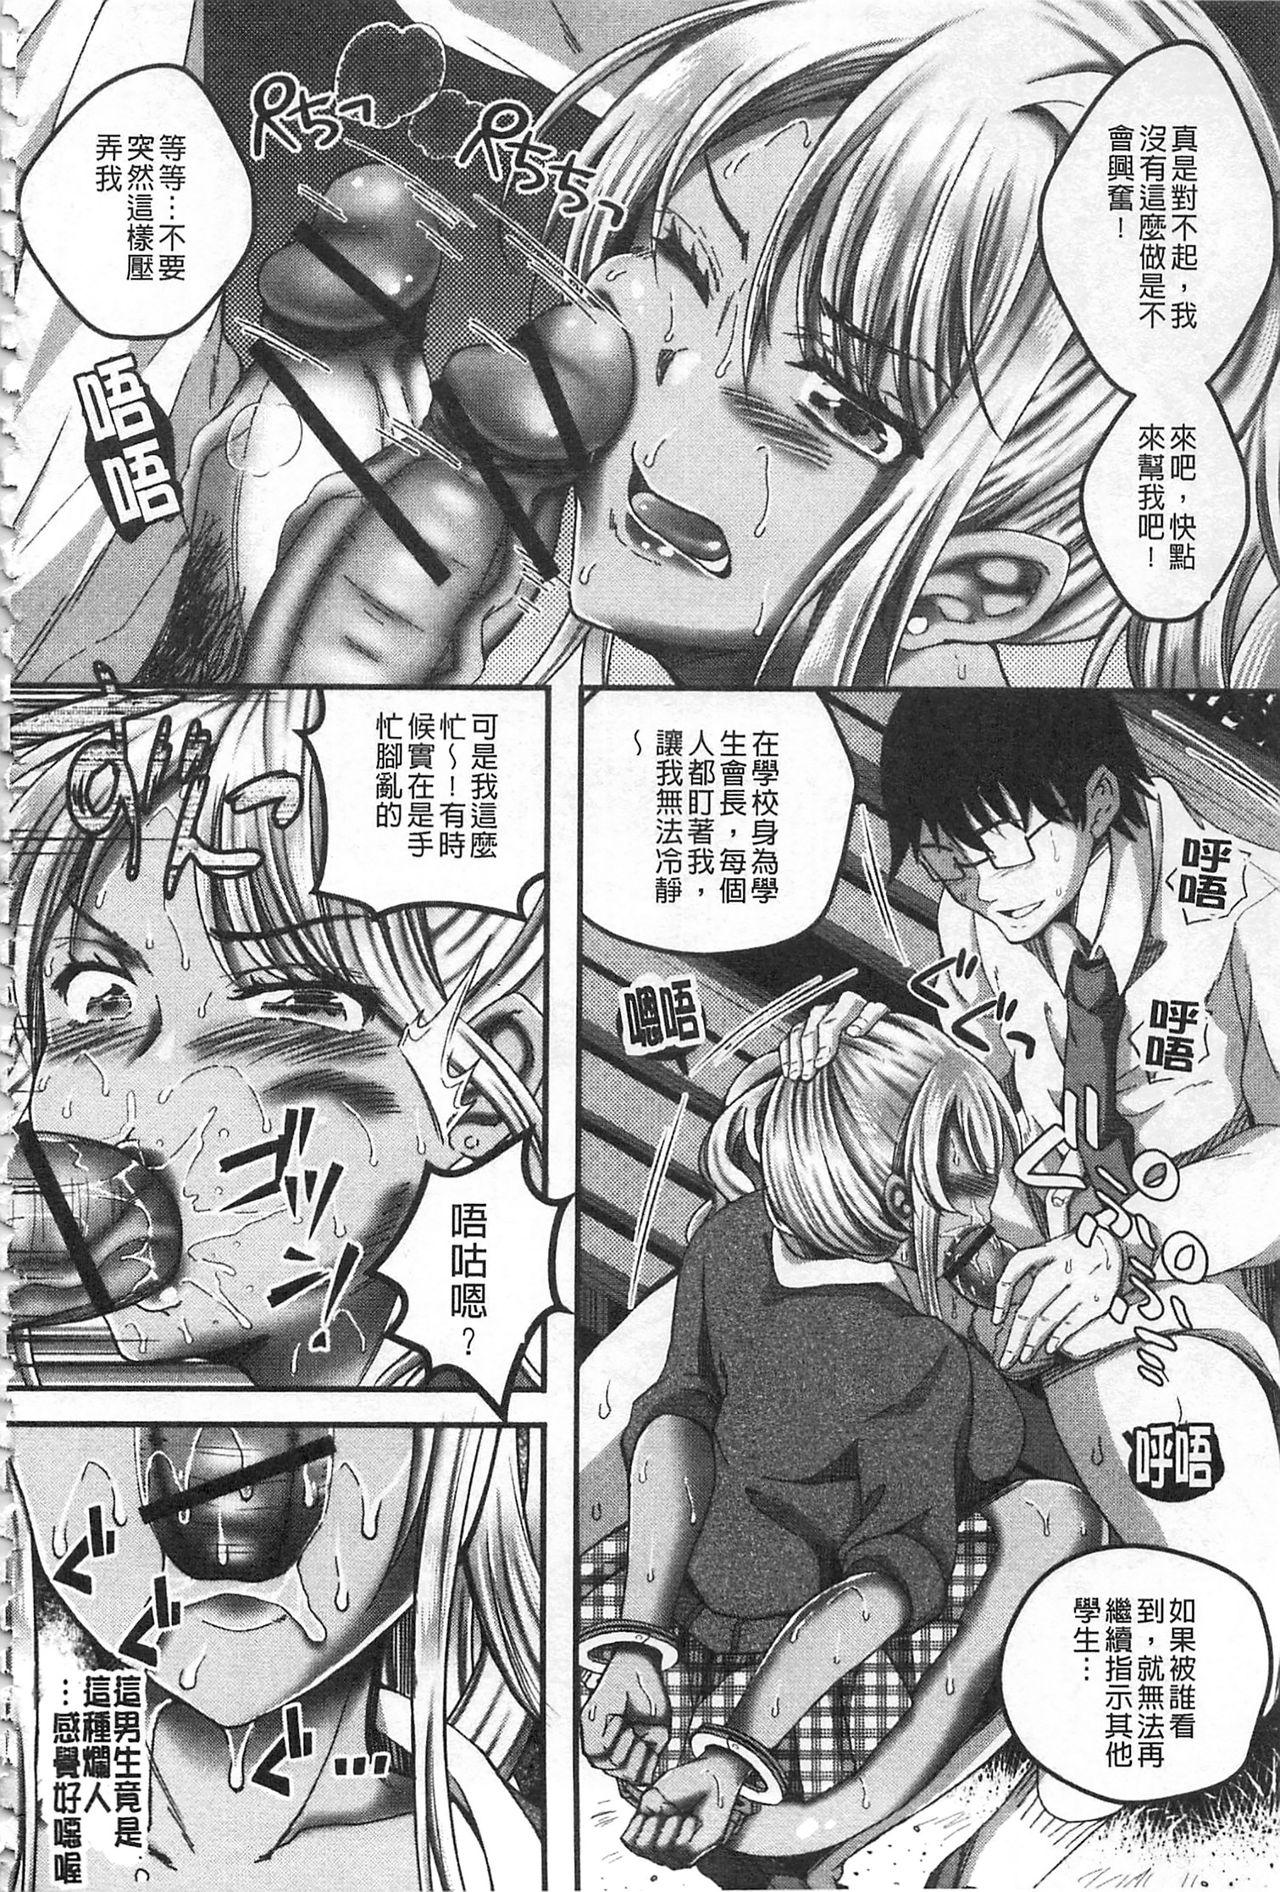 Kanjuku Otome no Odoshikata | 姦熟乙女的脅迫法 77